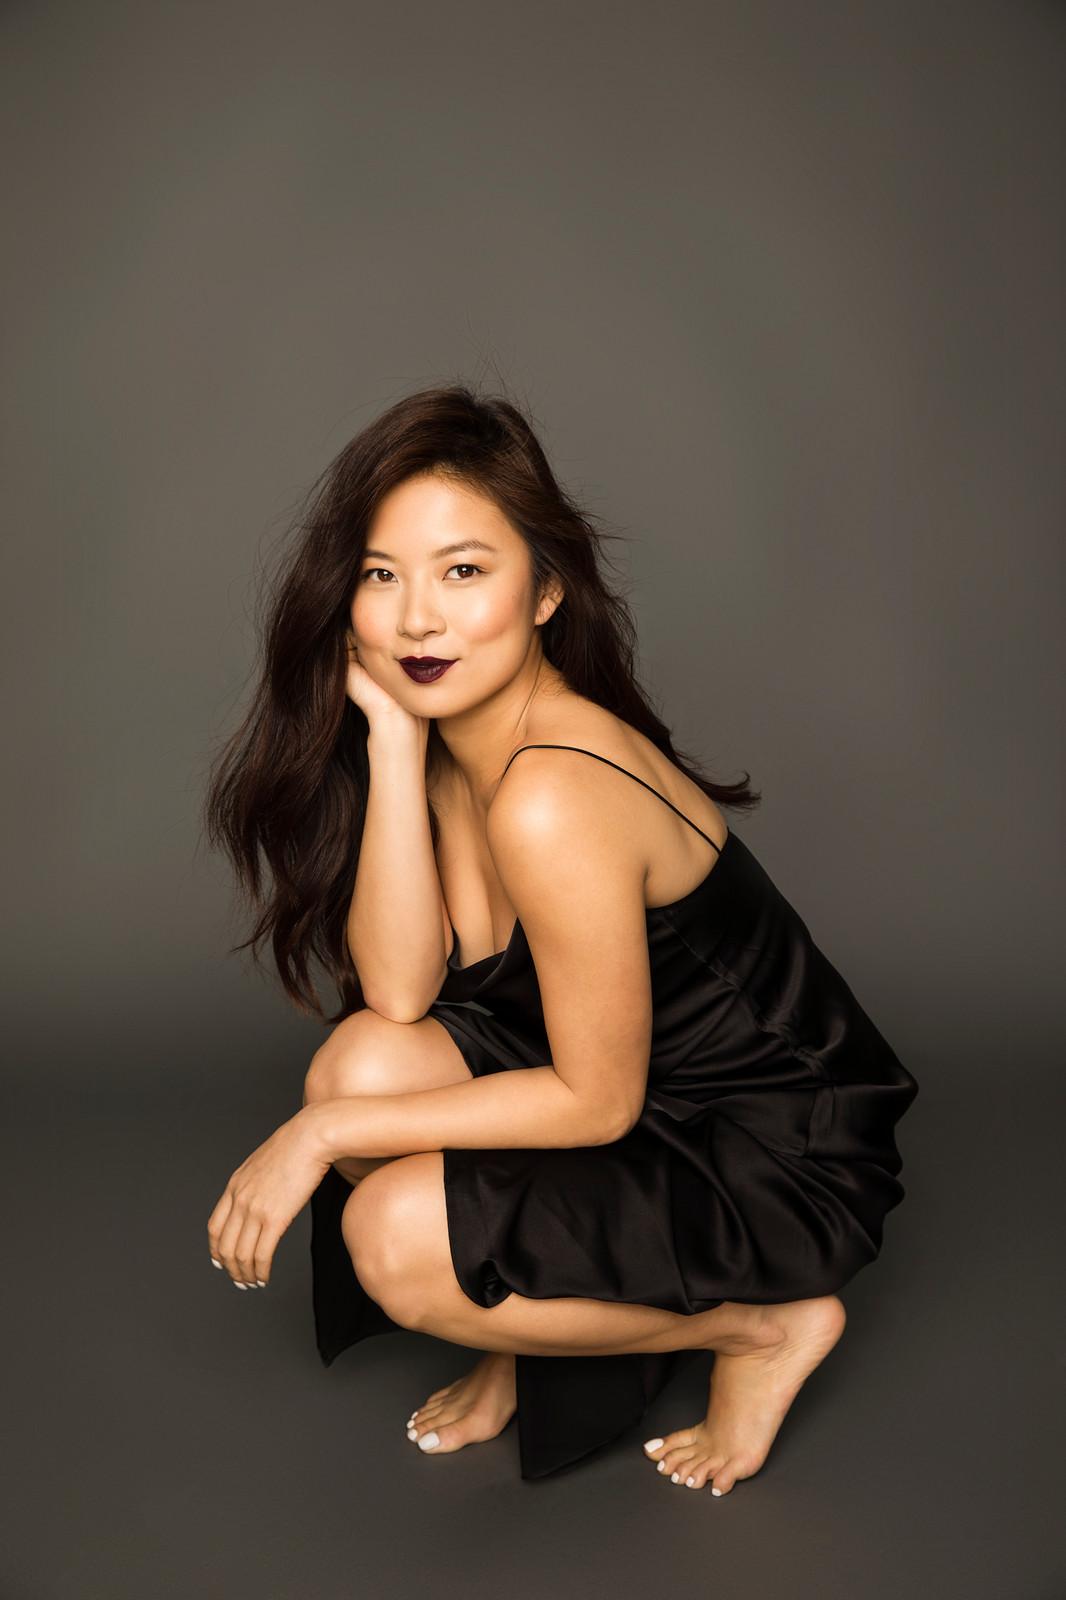 Christine Ko nude (38 foto and video), Sexy, Hot, Selfie, panties 2020